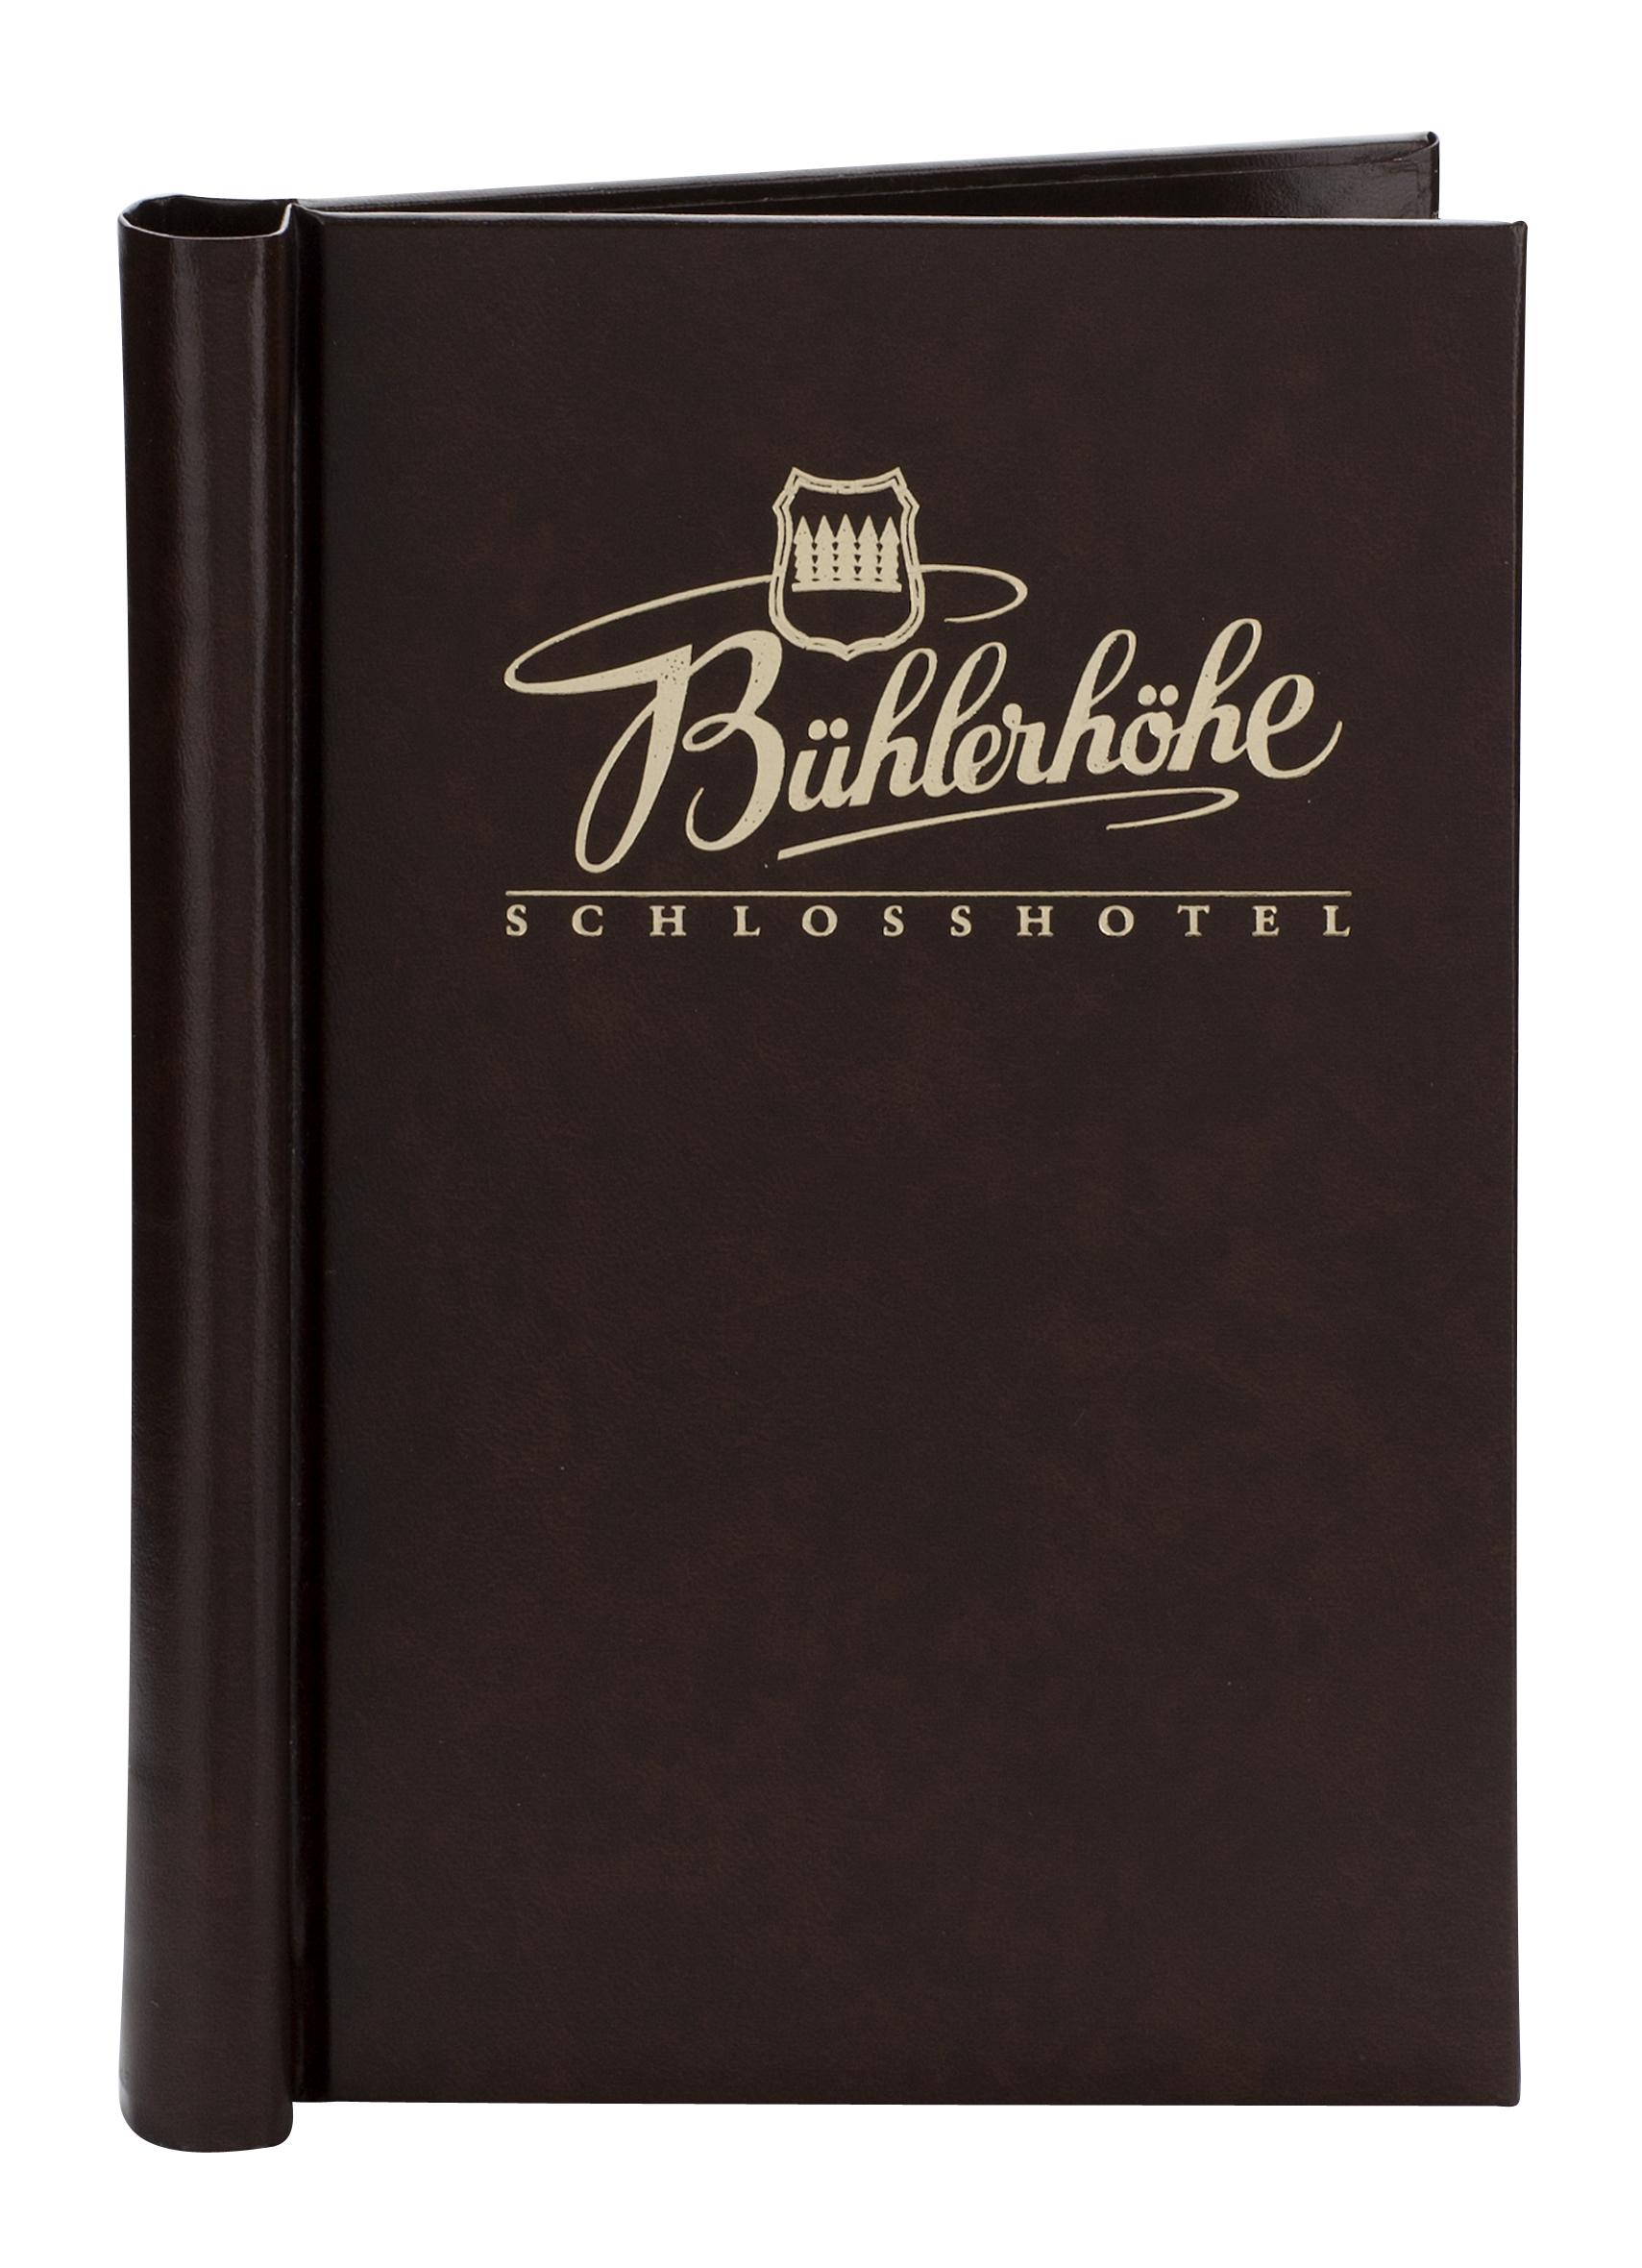 Hotelbedarf, Hotellerie, Hotelkarte, Gastrokarten, Gastronomiebedarf,